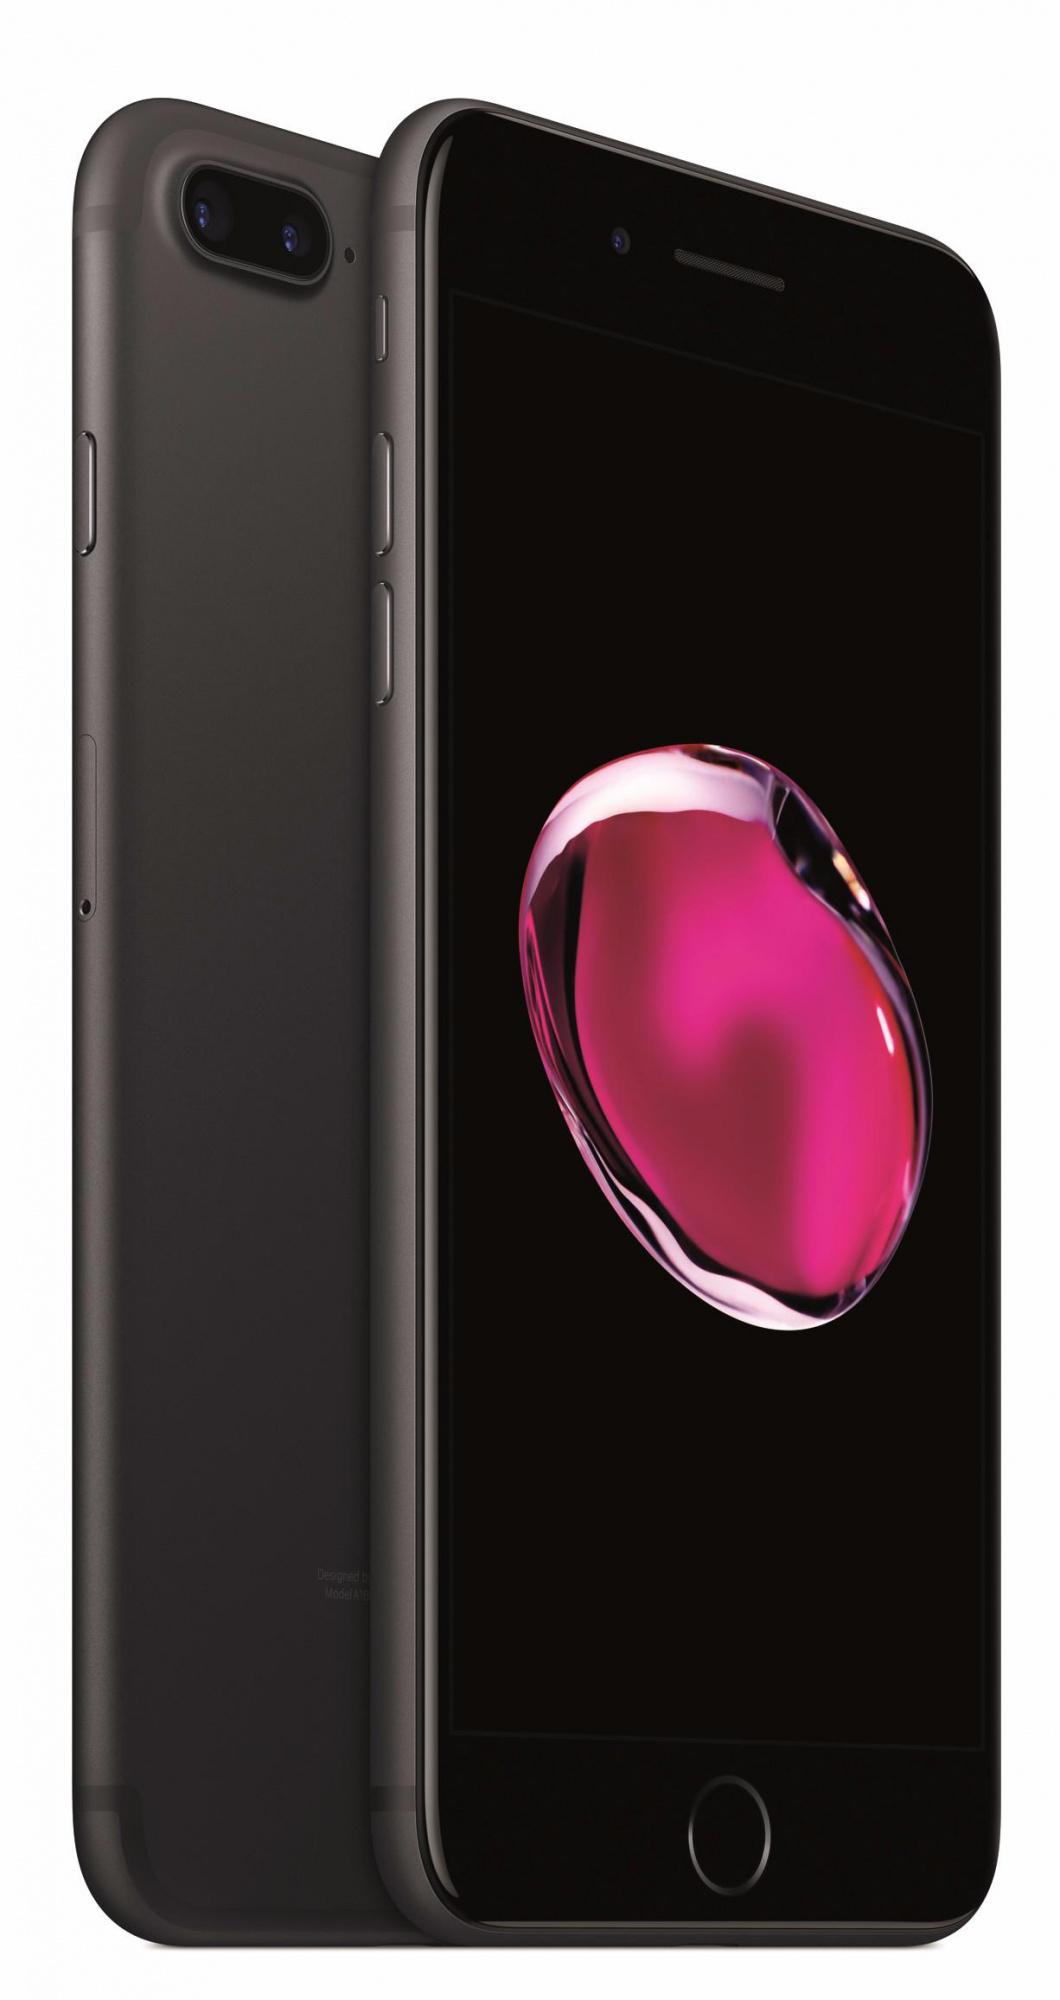 Мобильный телефон Apple iPhone 7 Plus 256Gb (Mate Black)